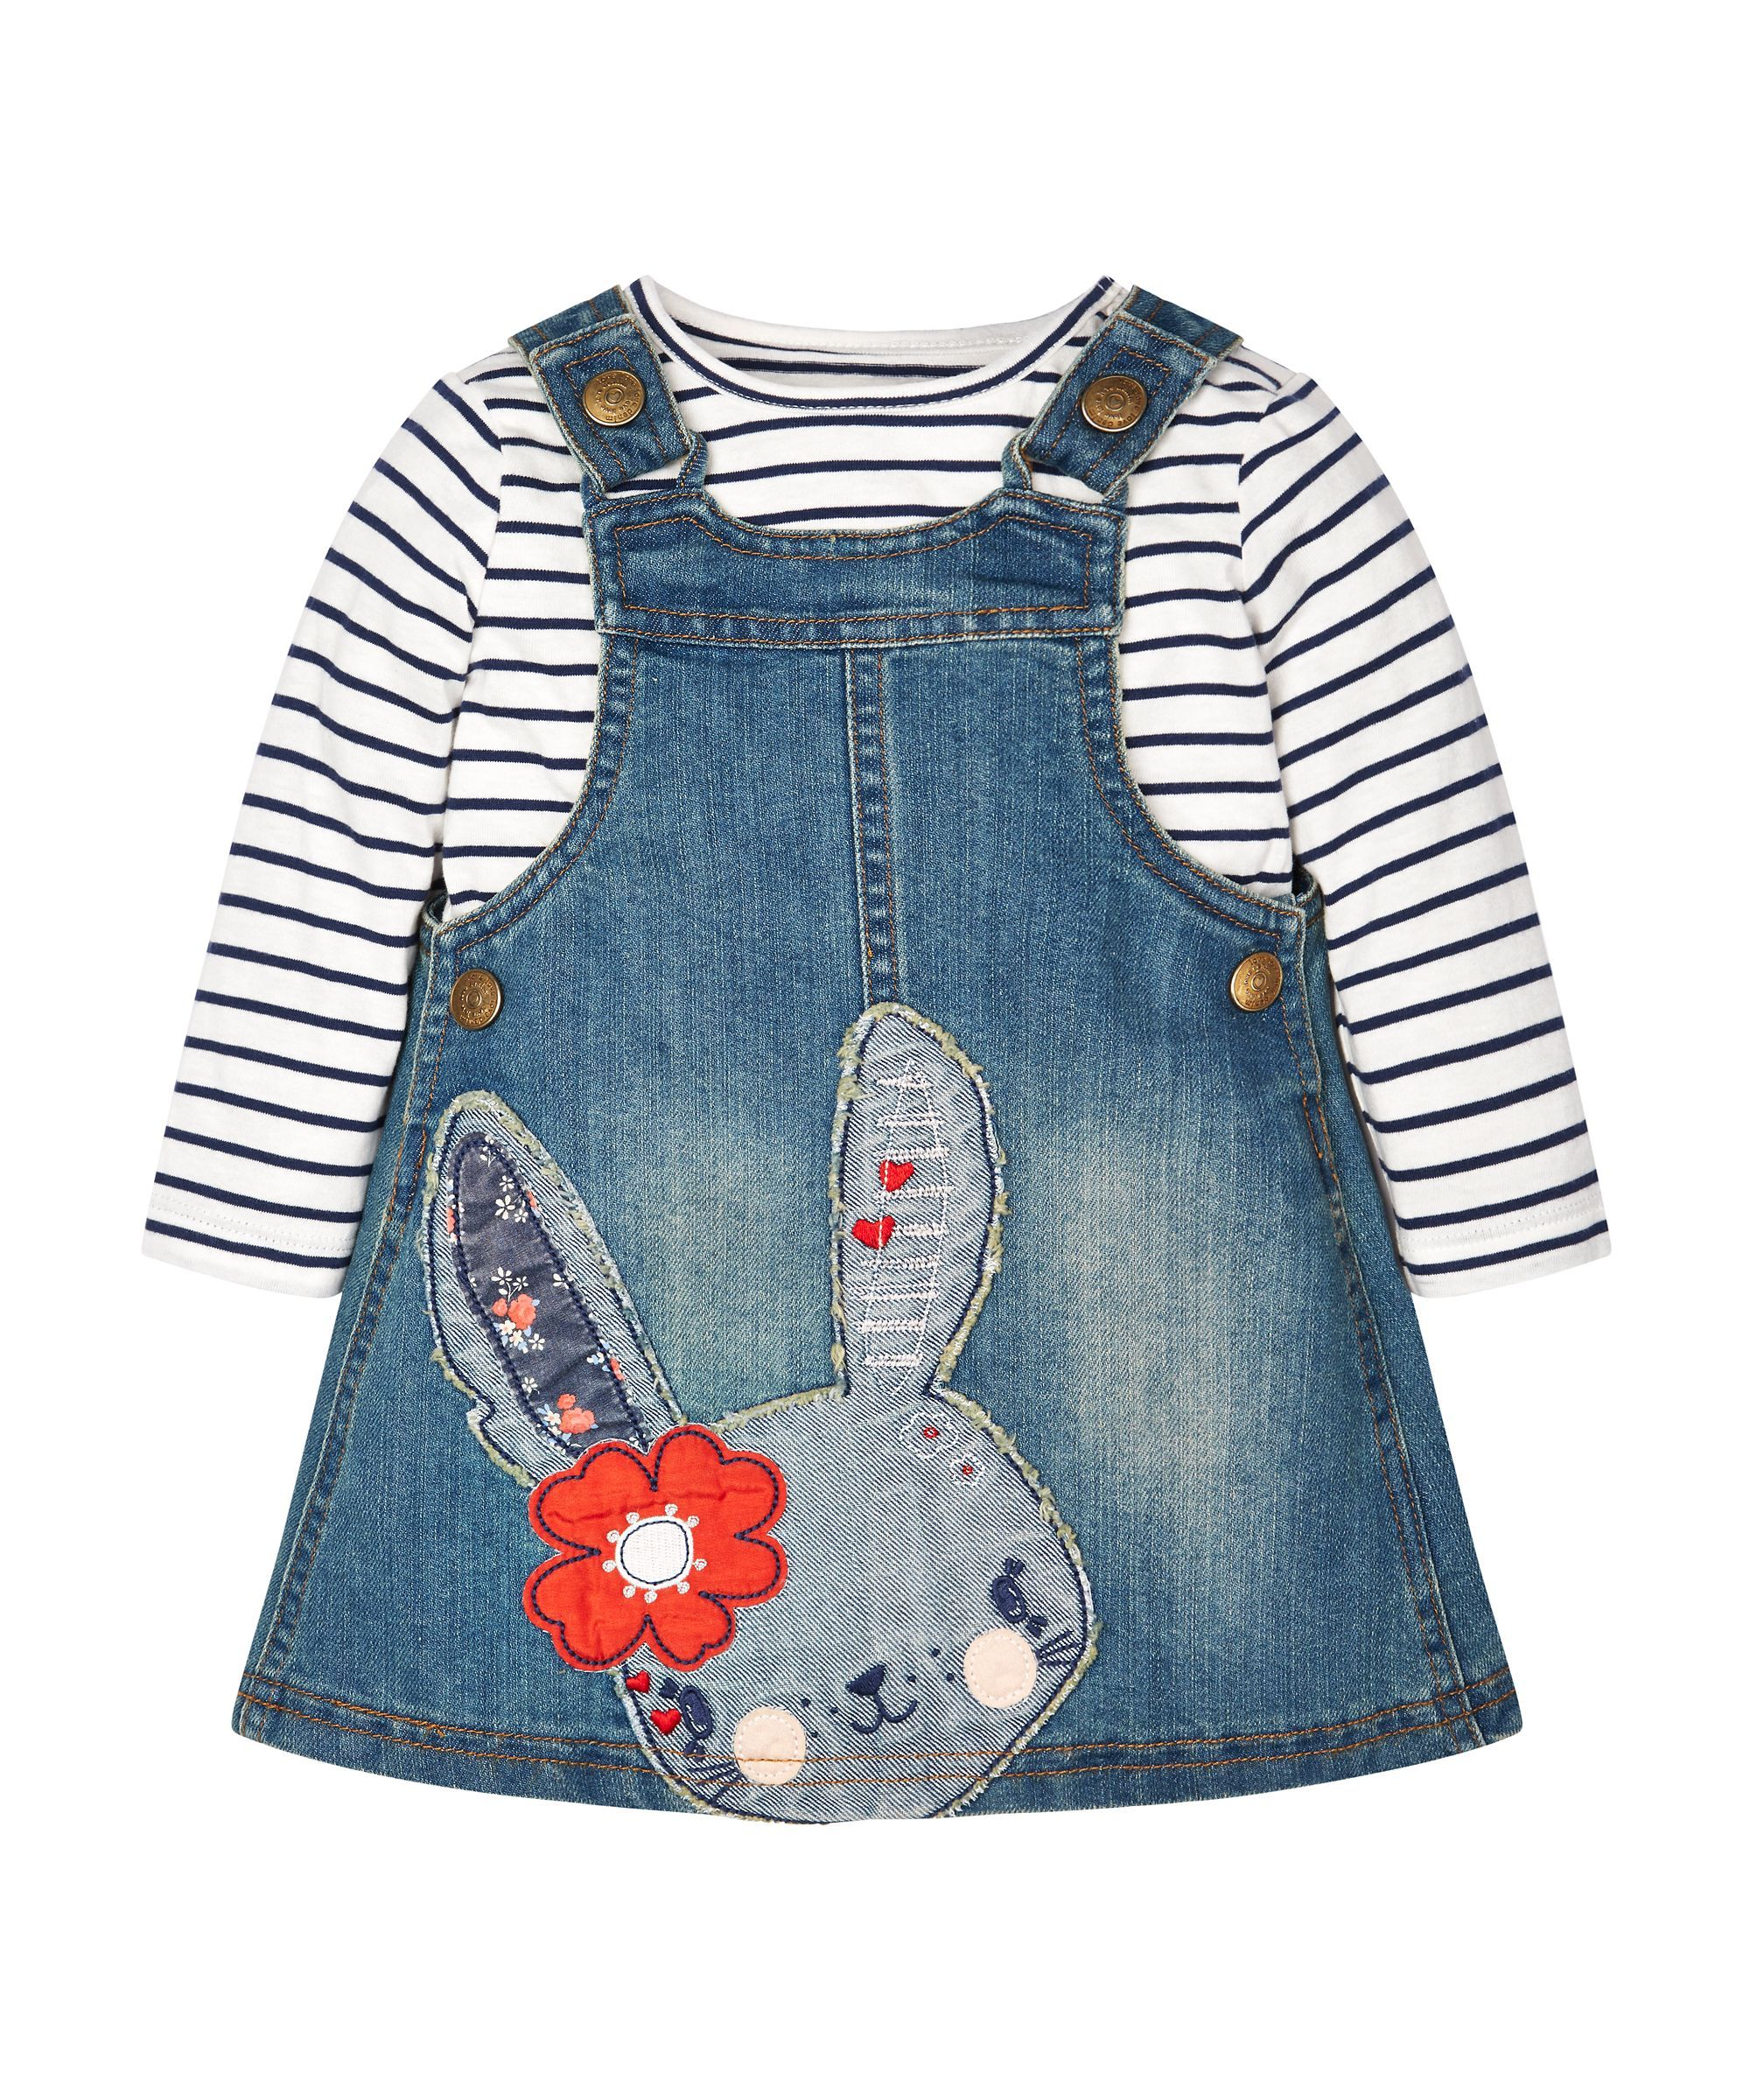 c88cb31f6e046 Denim Bunny Pinny and T-Shirt Set | for little girls | Baby girl ...